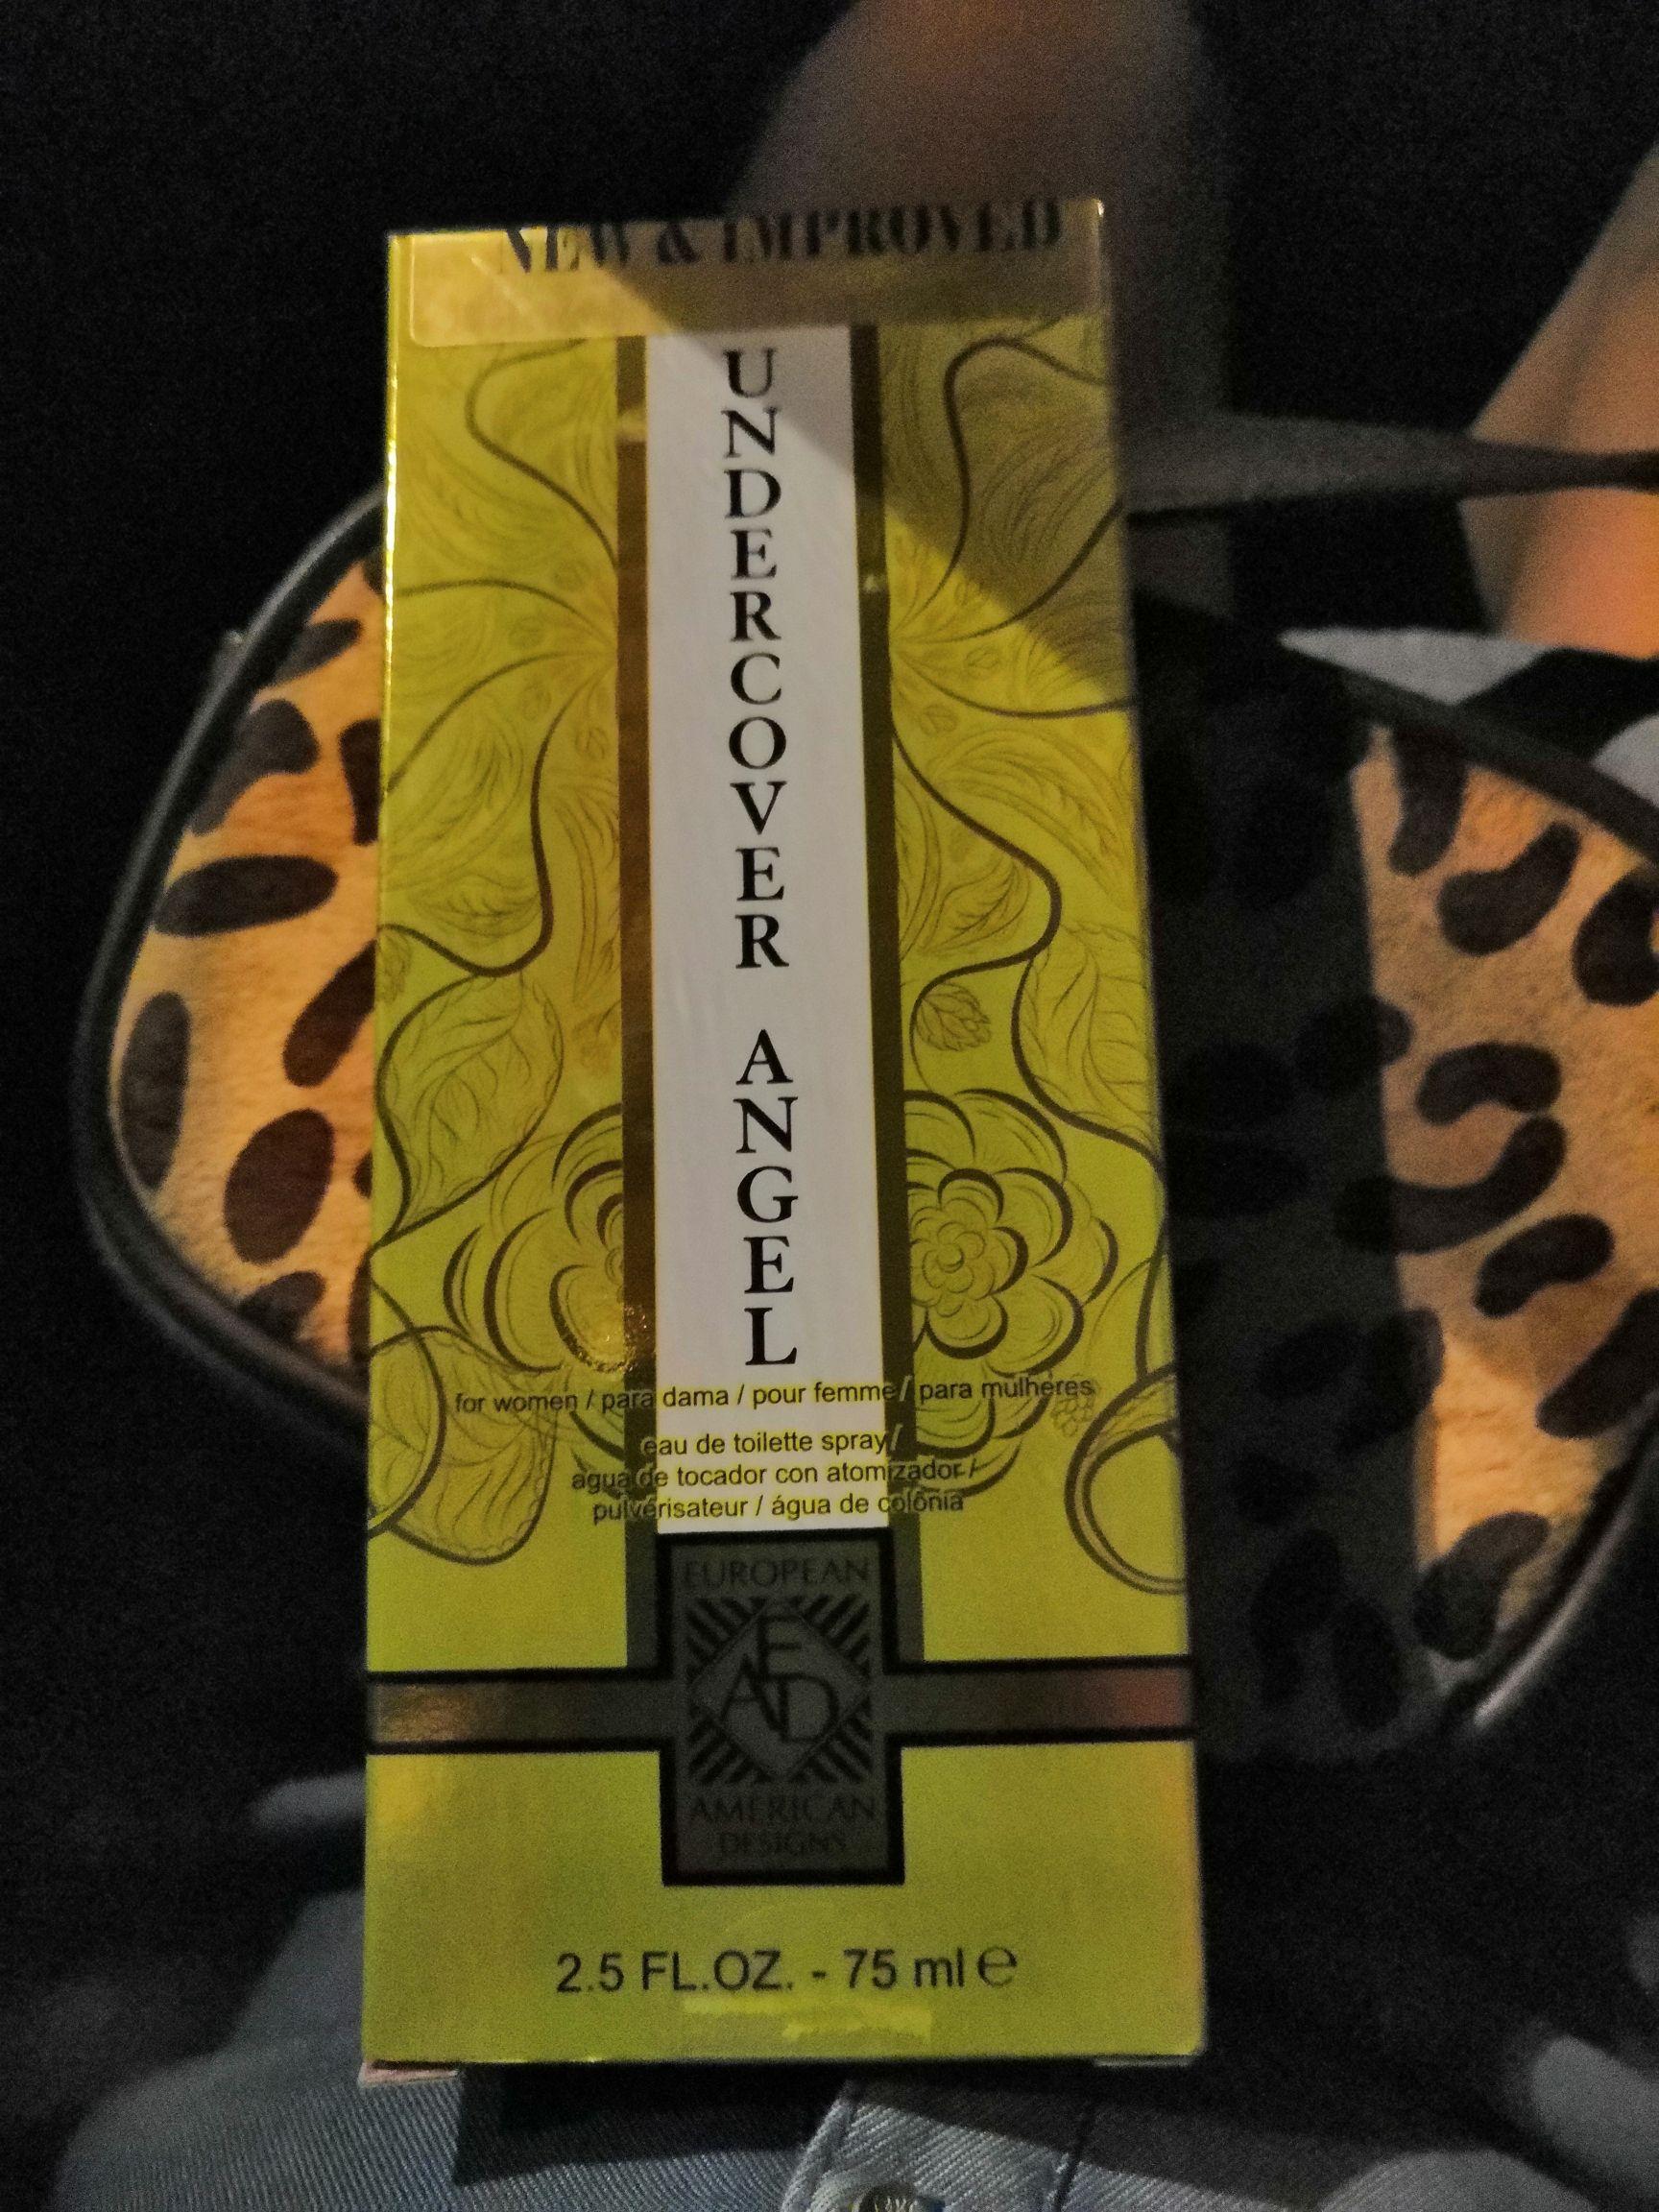 Chedraui Fortuna: Perfume EAD Spray Undercover Angel